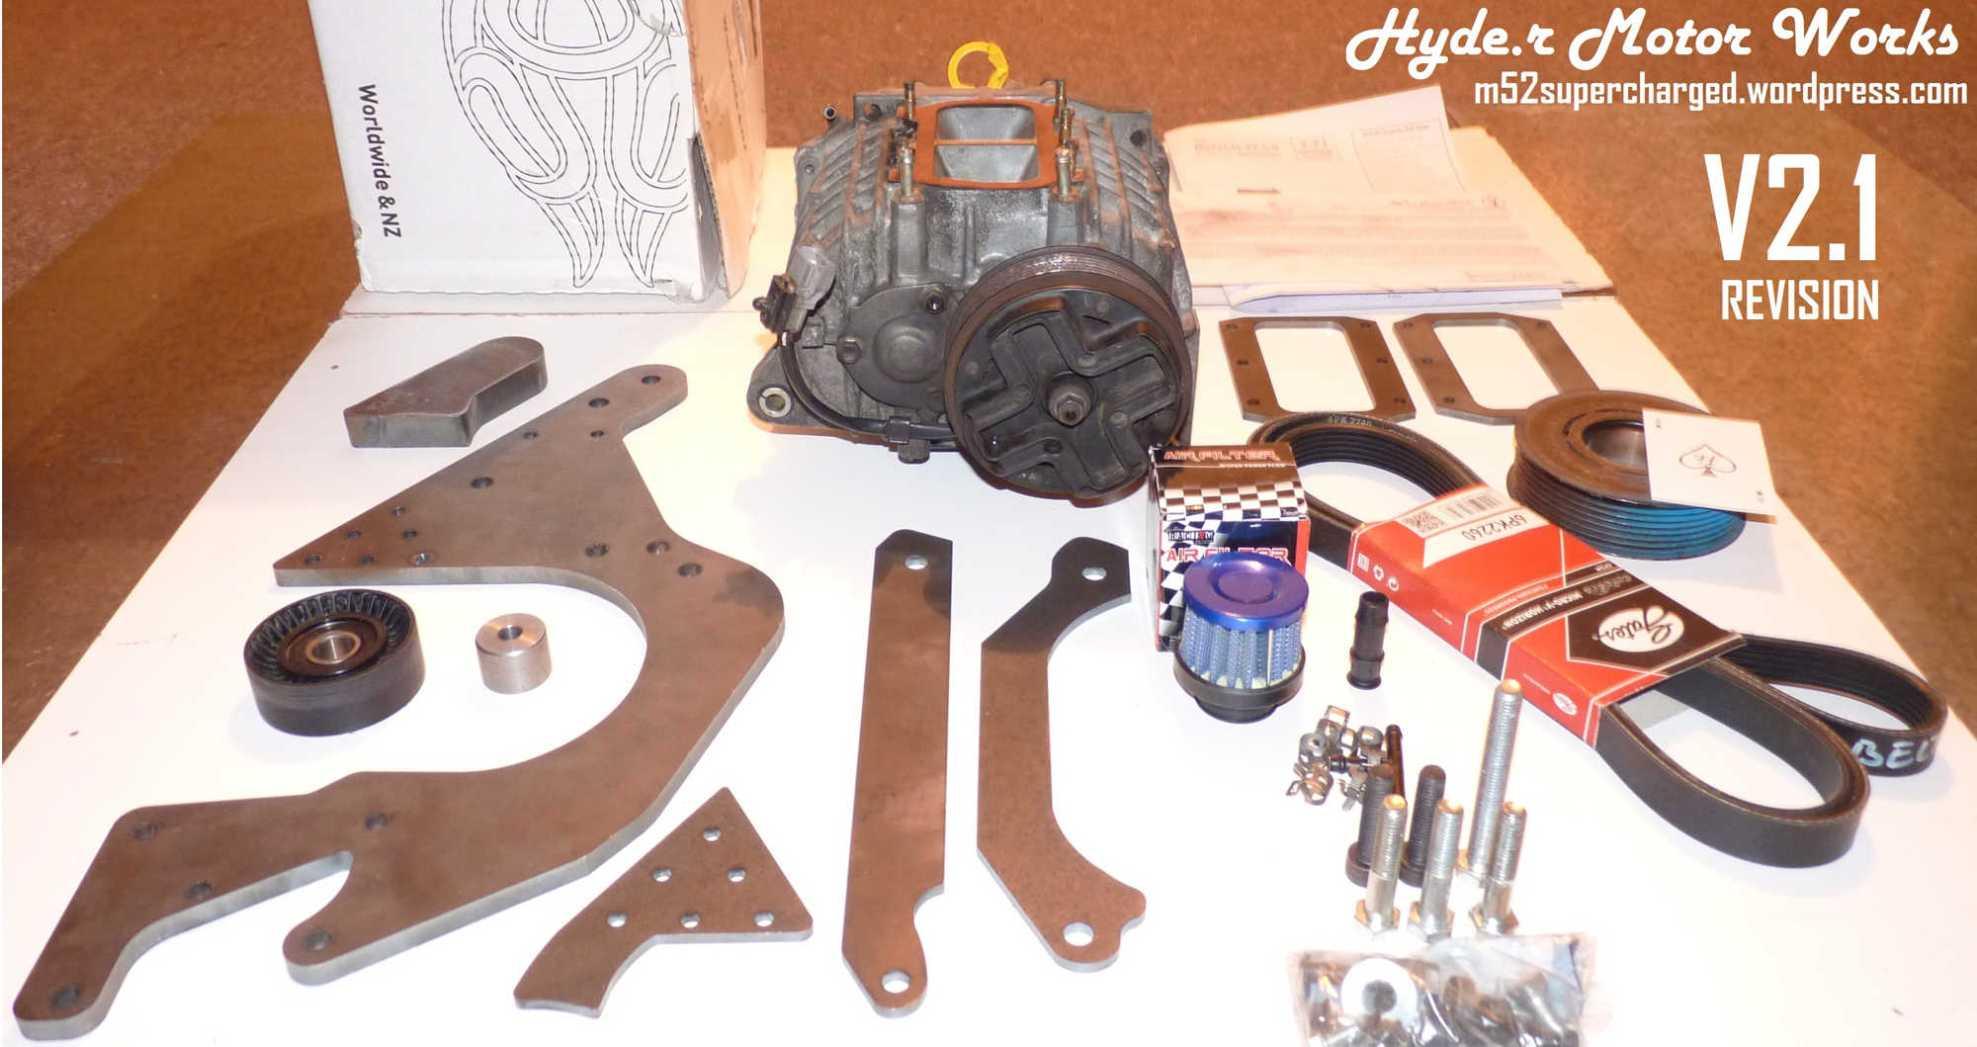 Diy supercharger time - Eaton m62 on m54b30 - E46Fanatics